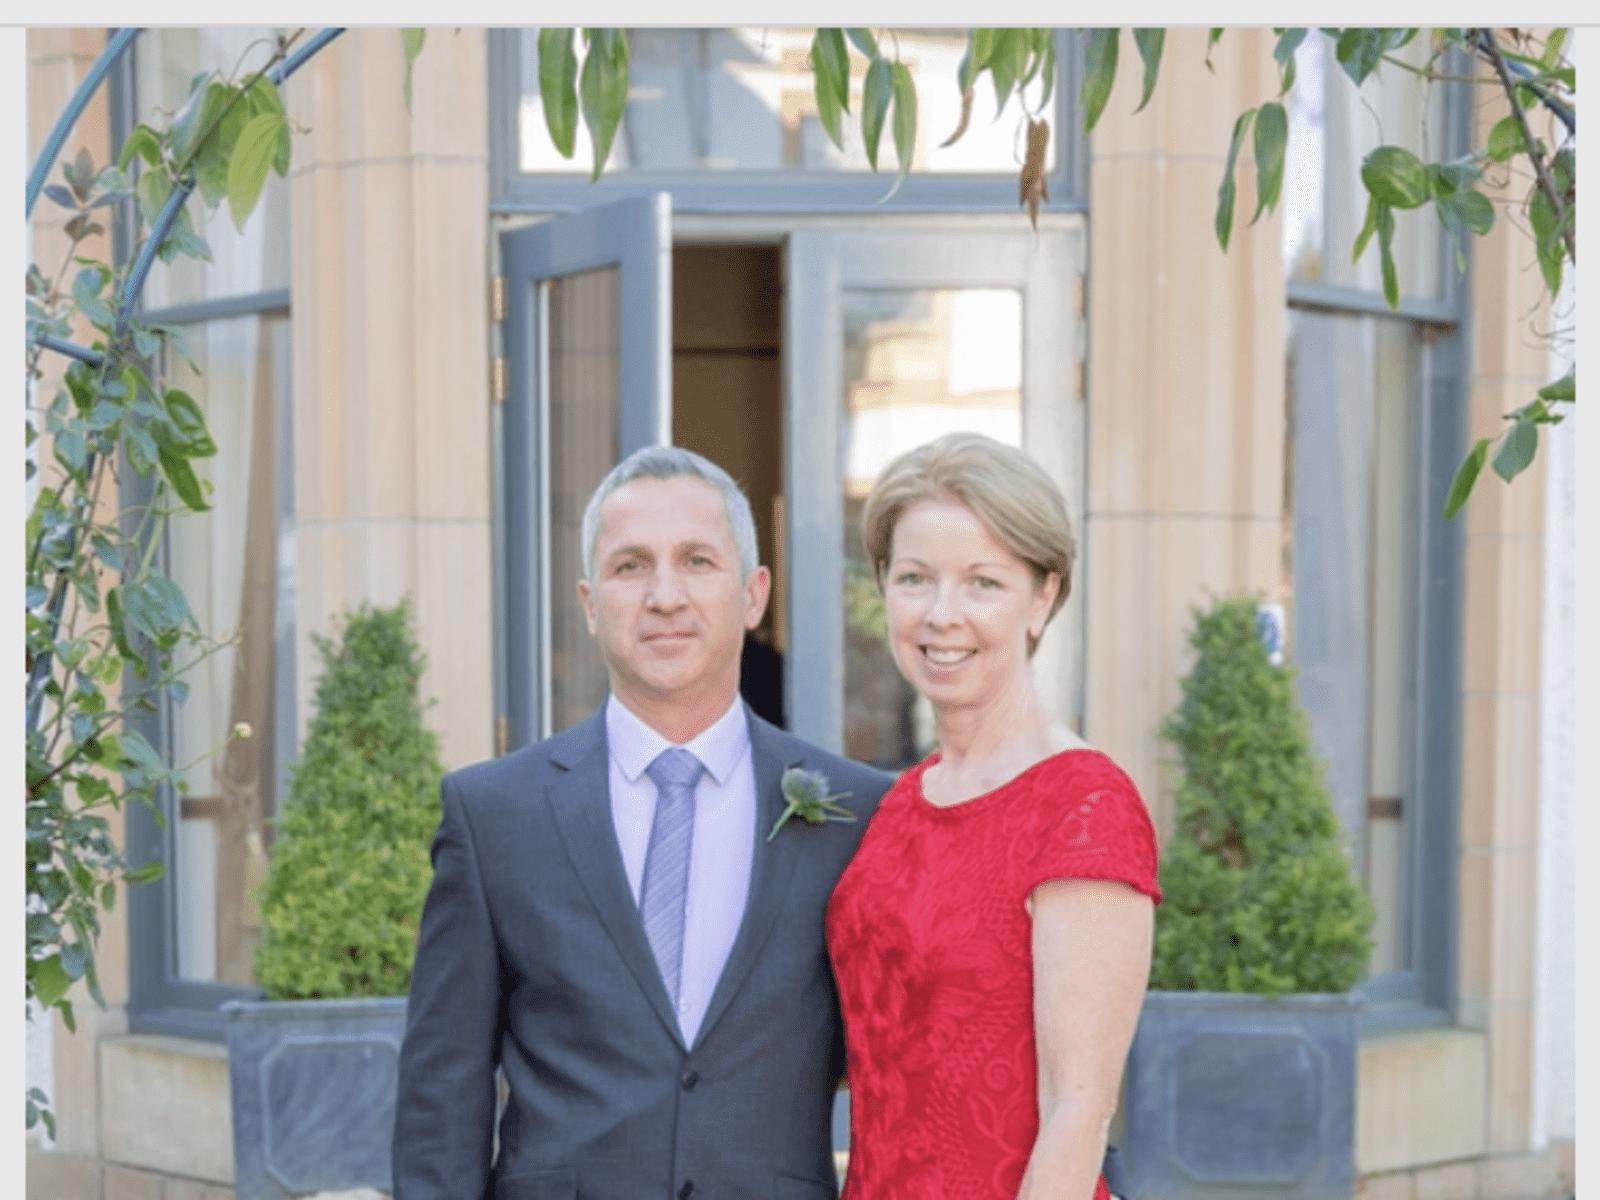 Steve & gillian & Gillian from Edinburgh, United Kingdom